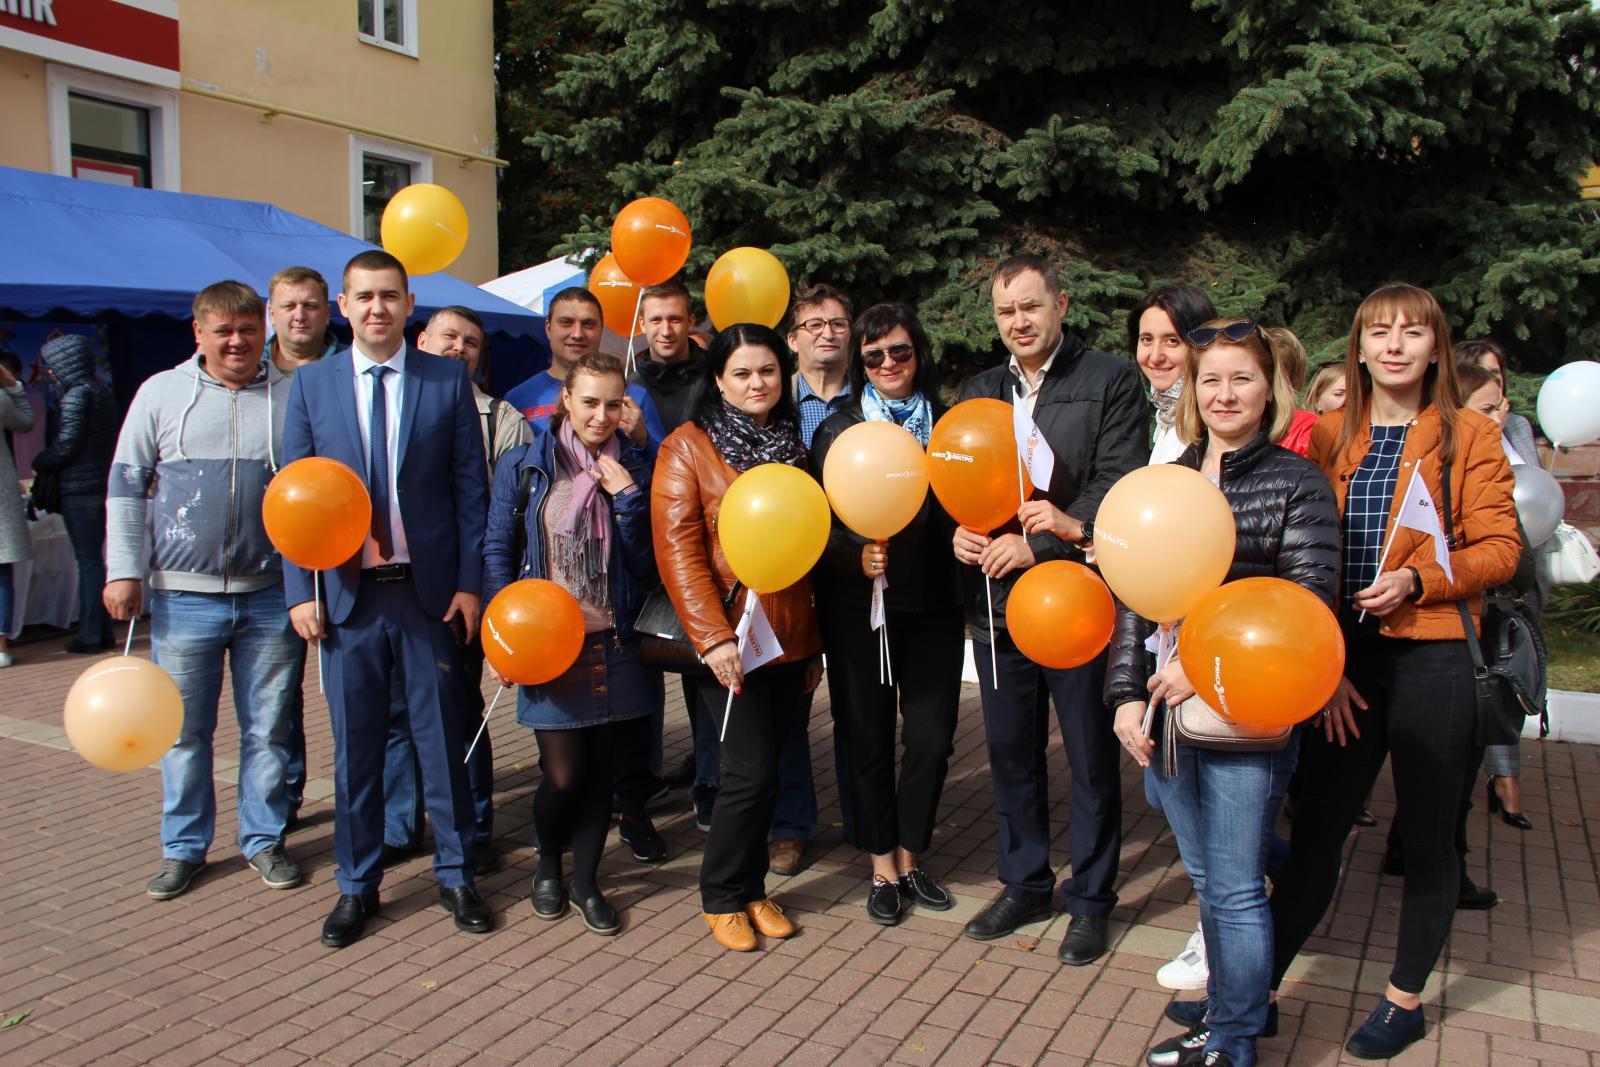 Сотрудники Филиала ООО «БрянскЭлектро» в Брянске приняли участие в праздновании Дня города